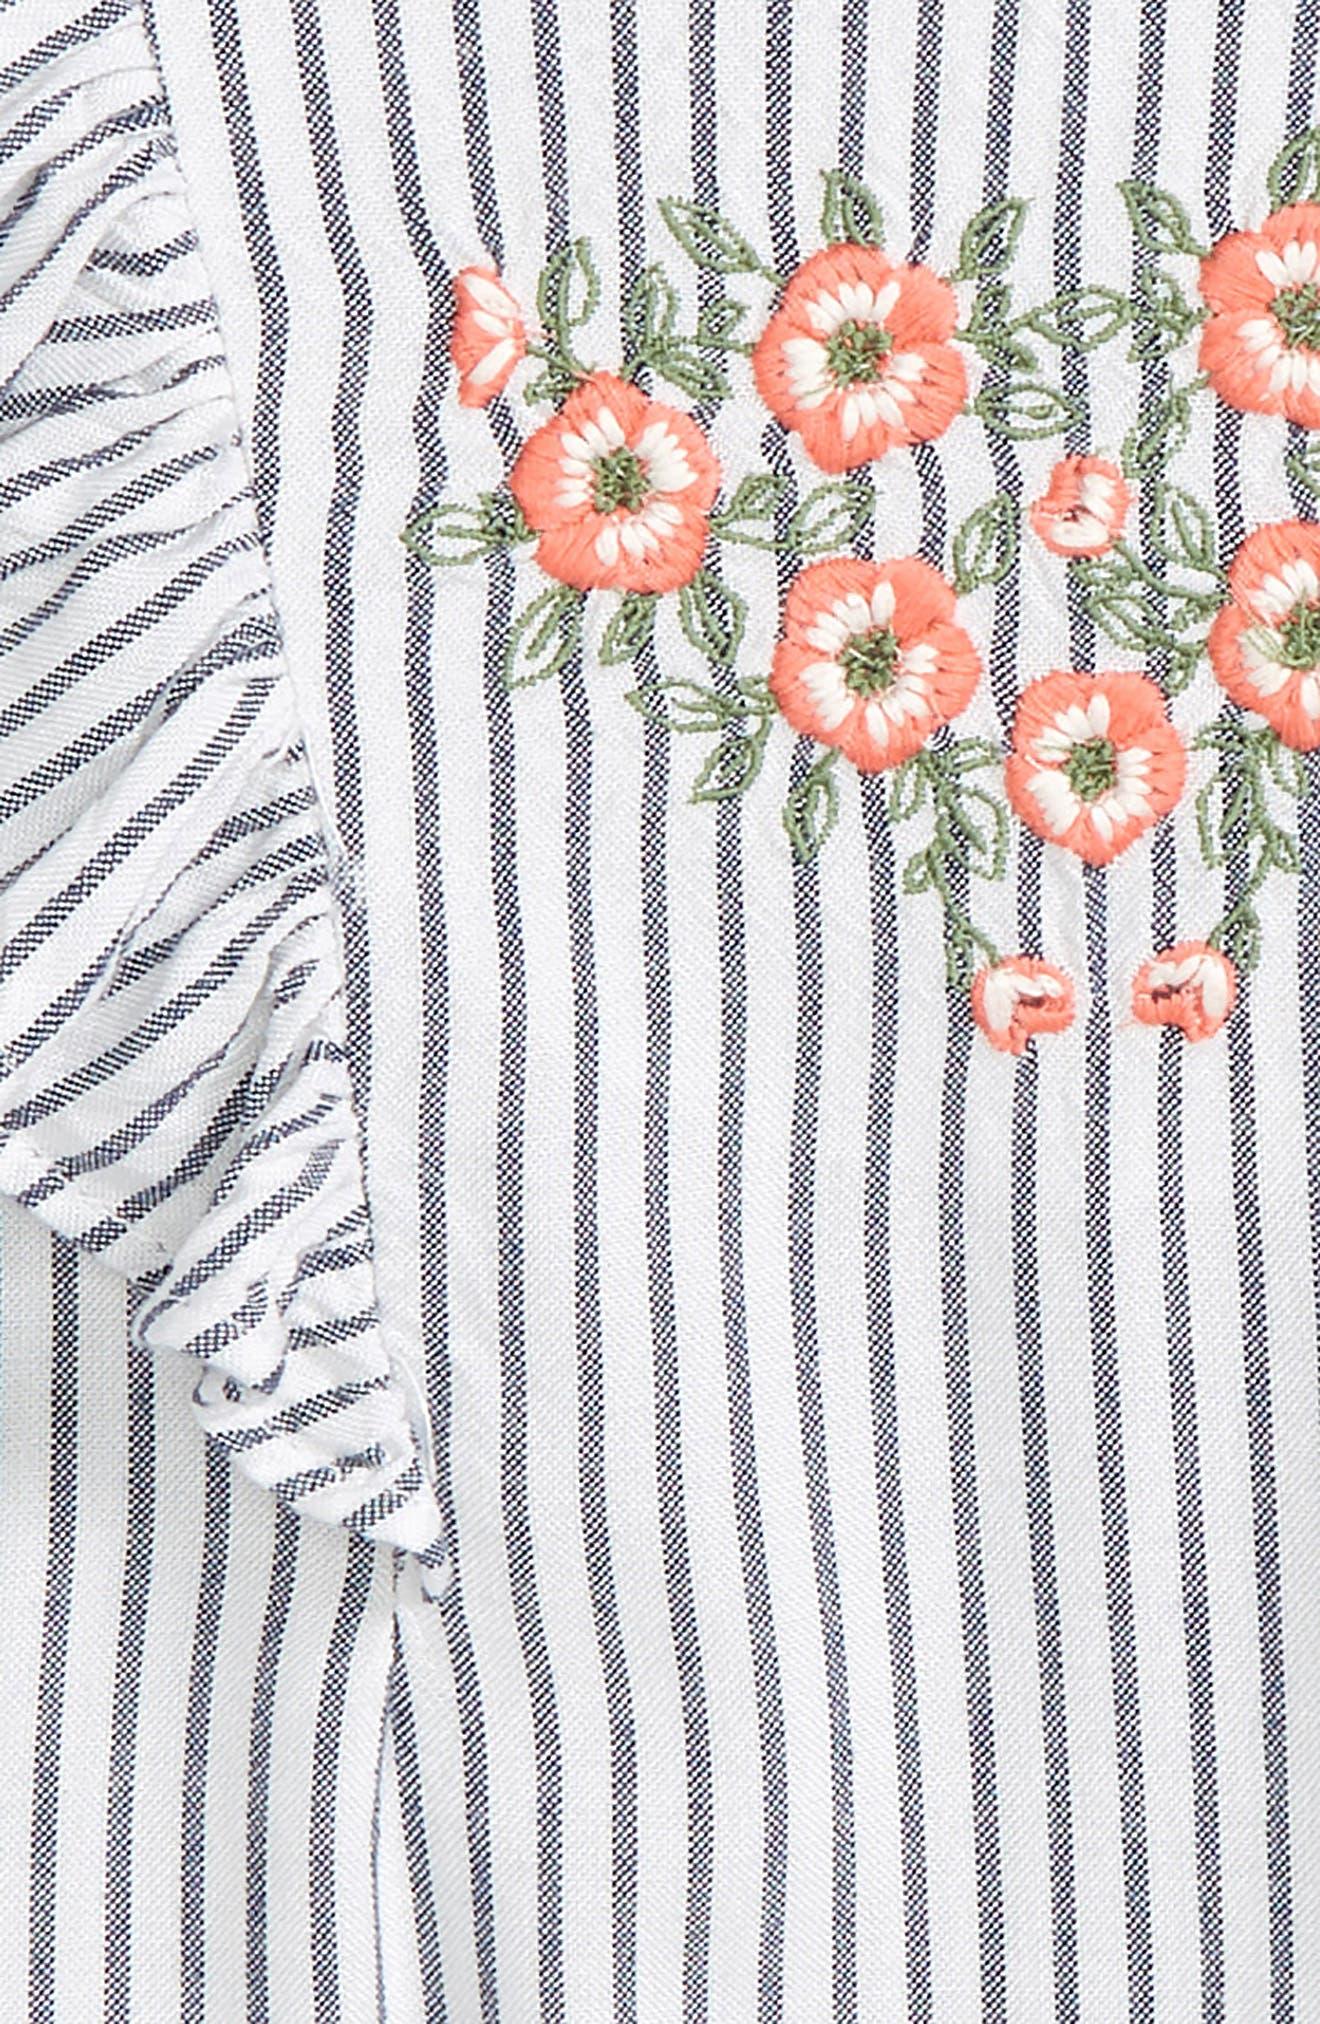 Flutter Sleeve Embroidered Romper,                             Alternate thumbnail 2, color,                             100